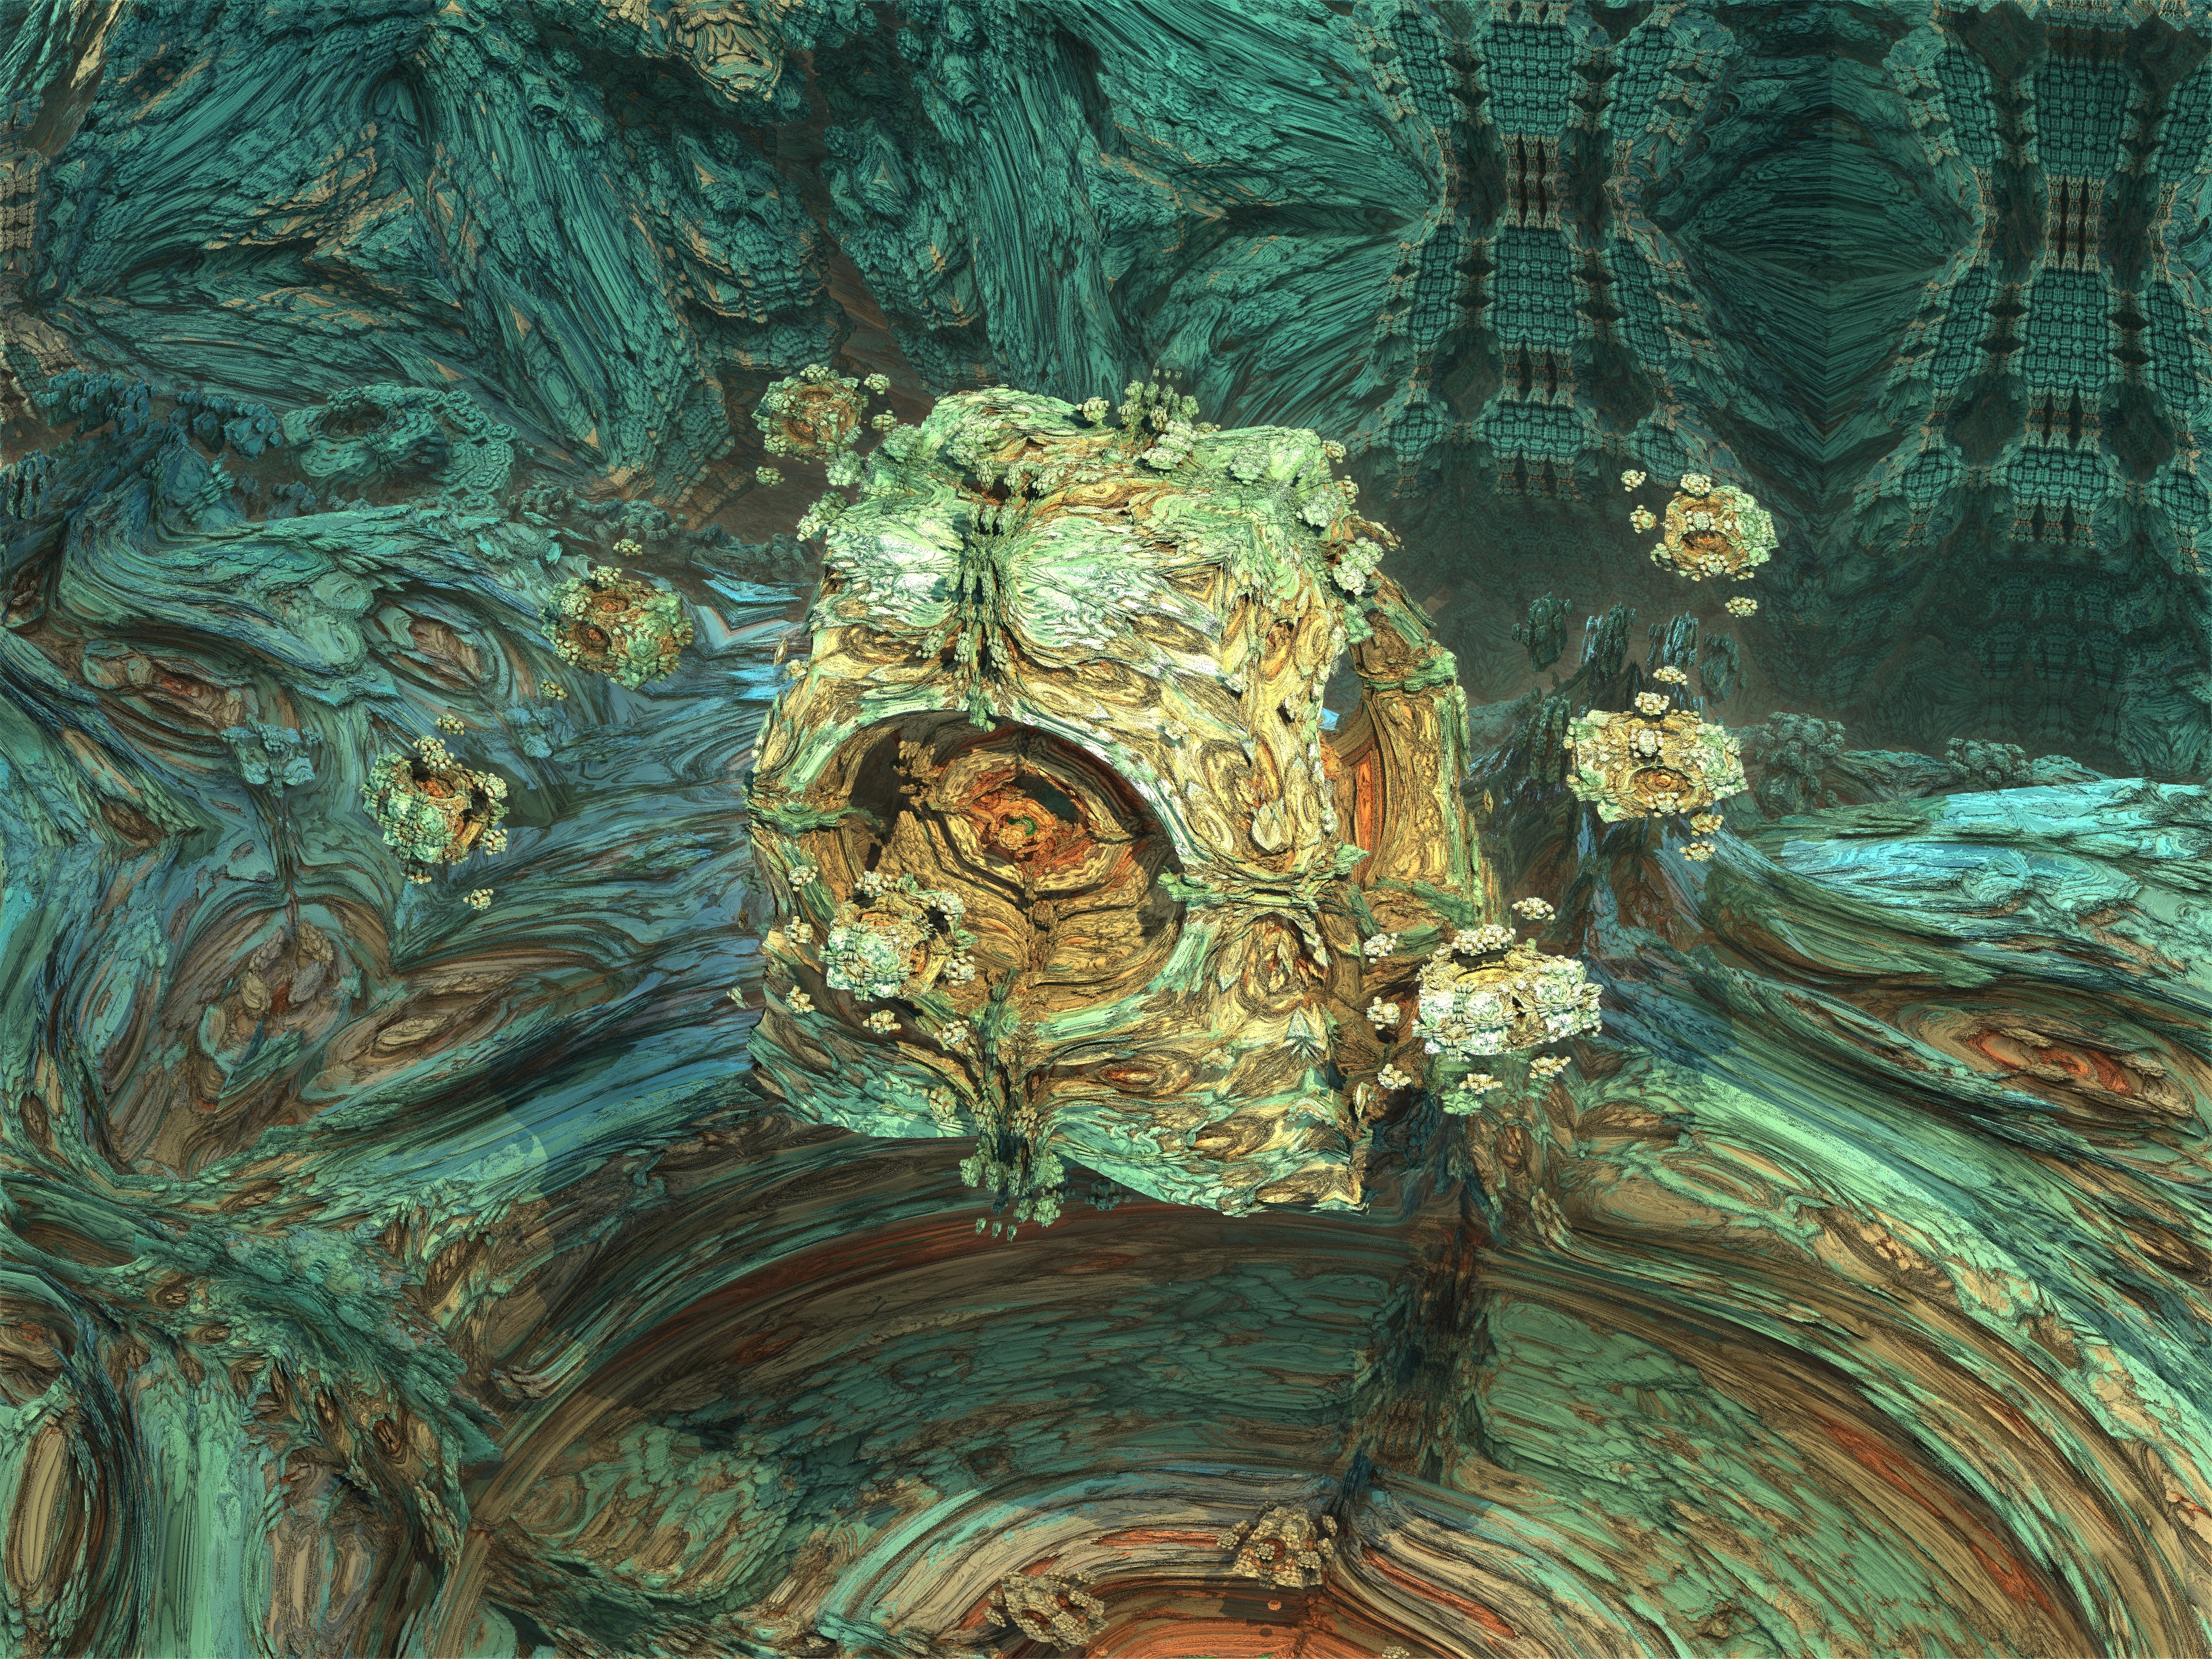 Corala-4Makin03 - Mandelbulb 3D fractal by schizo604